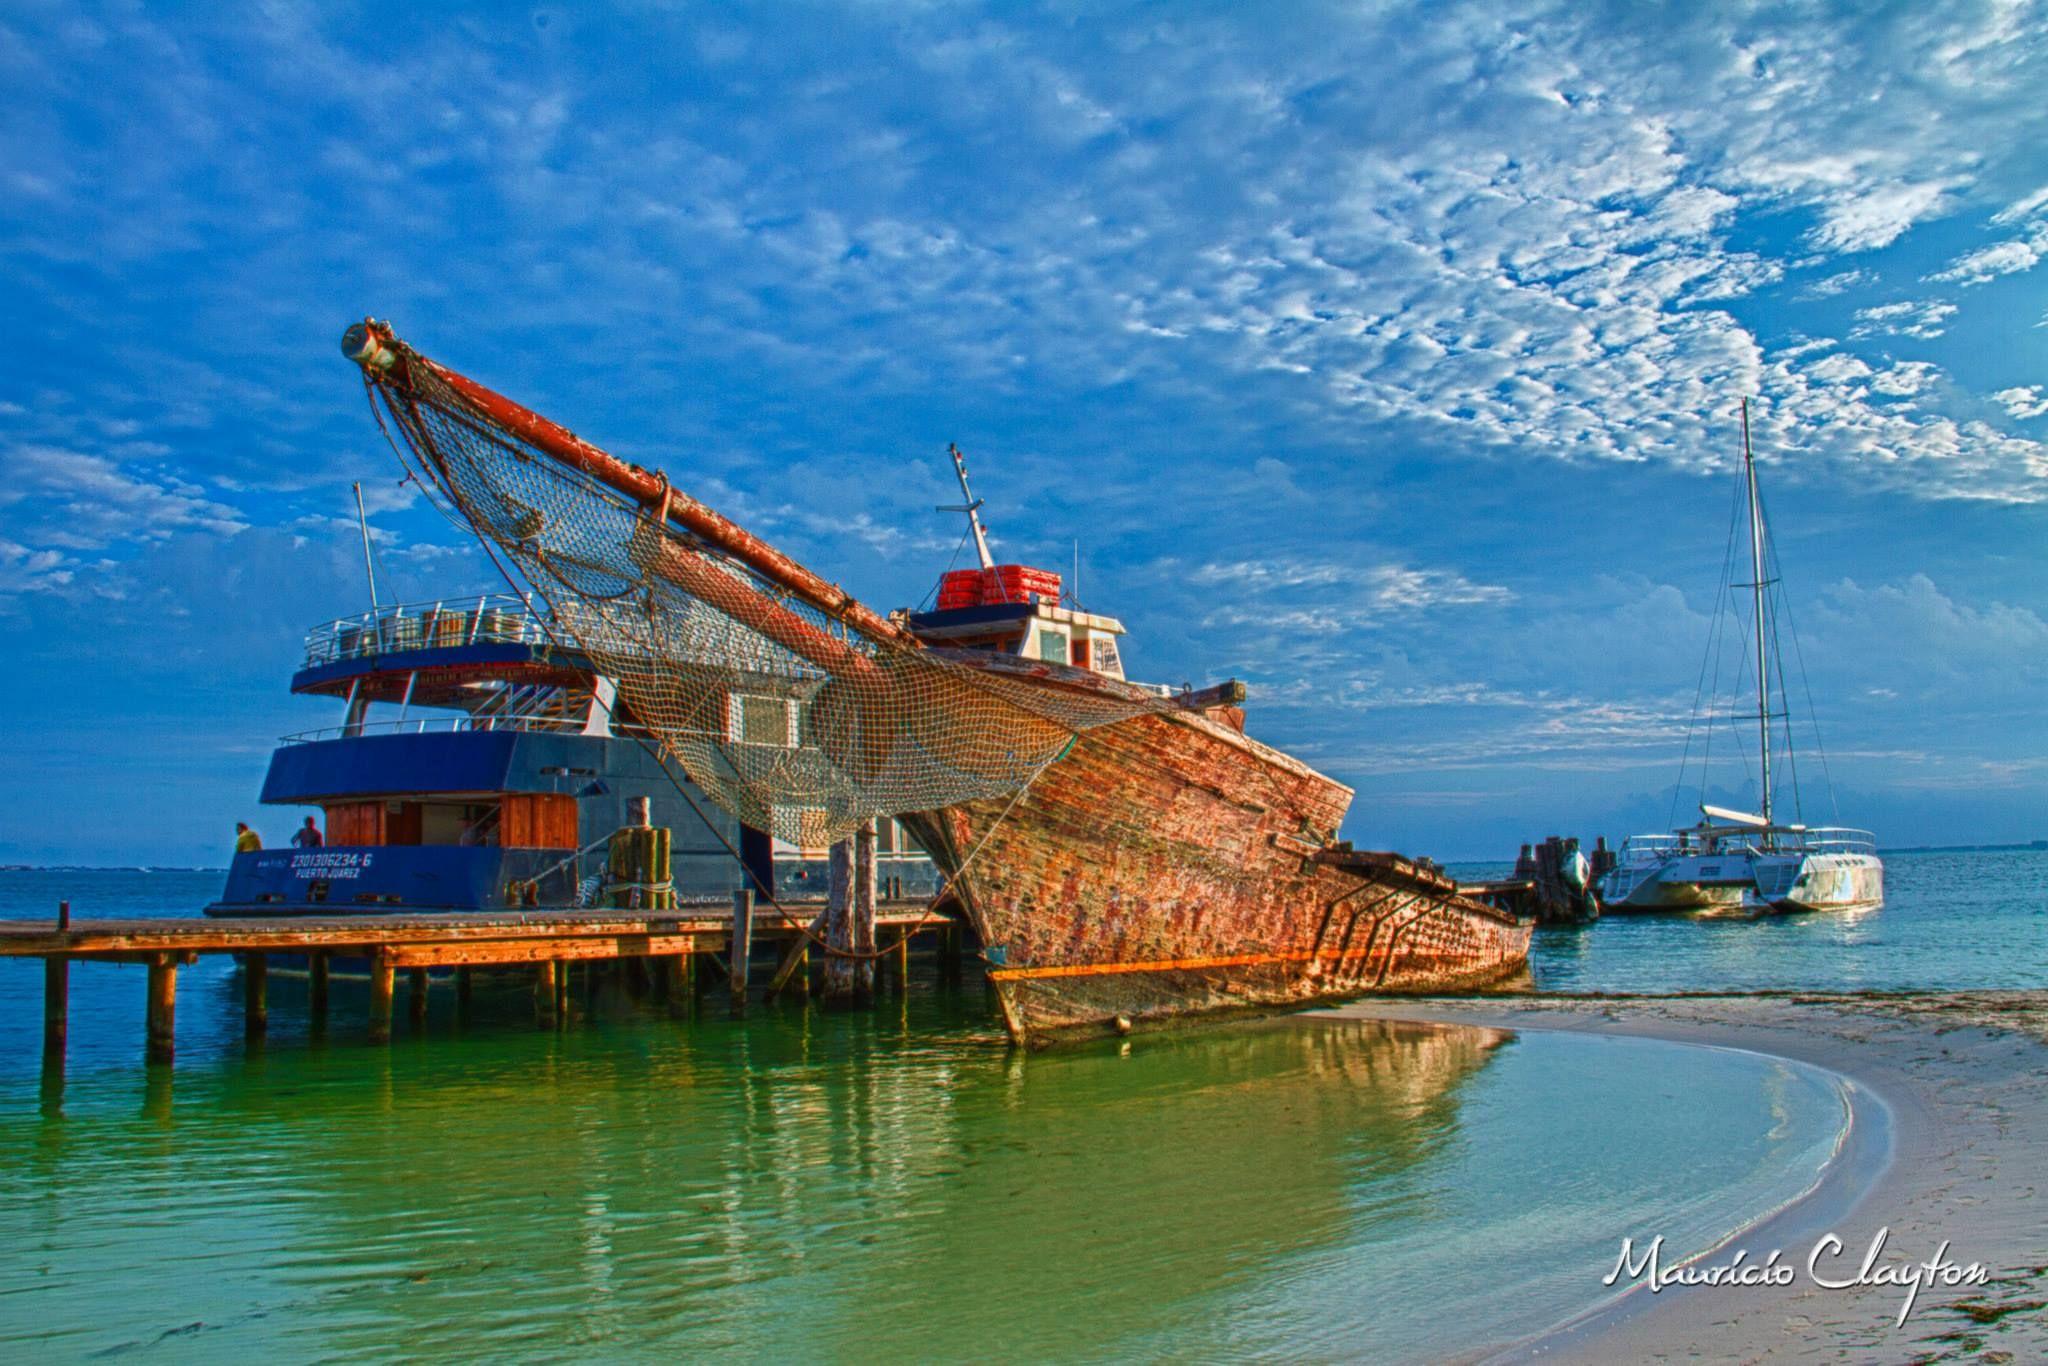 abandoned ship by mauricio.clayton